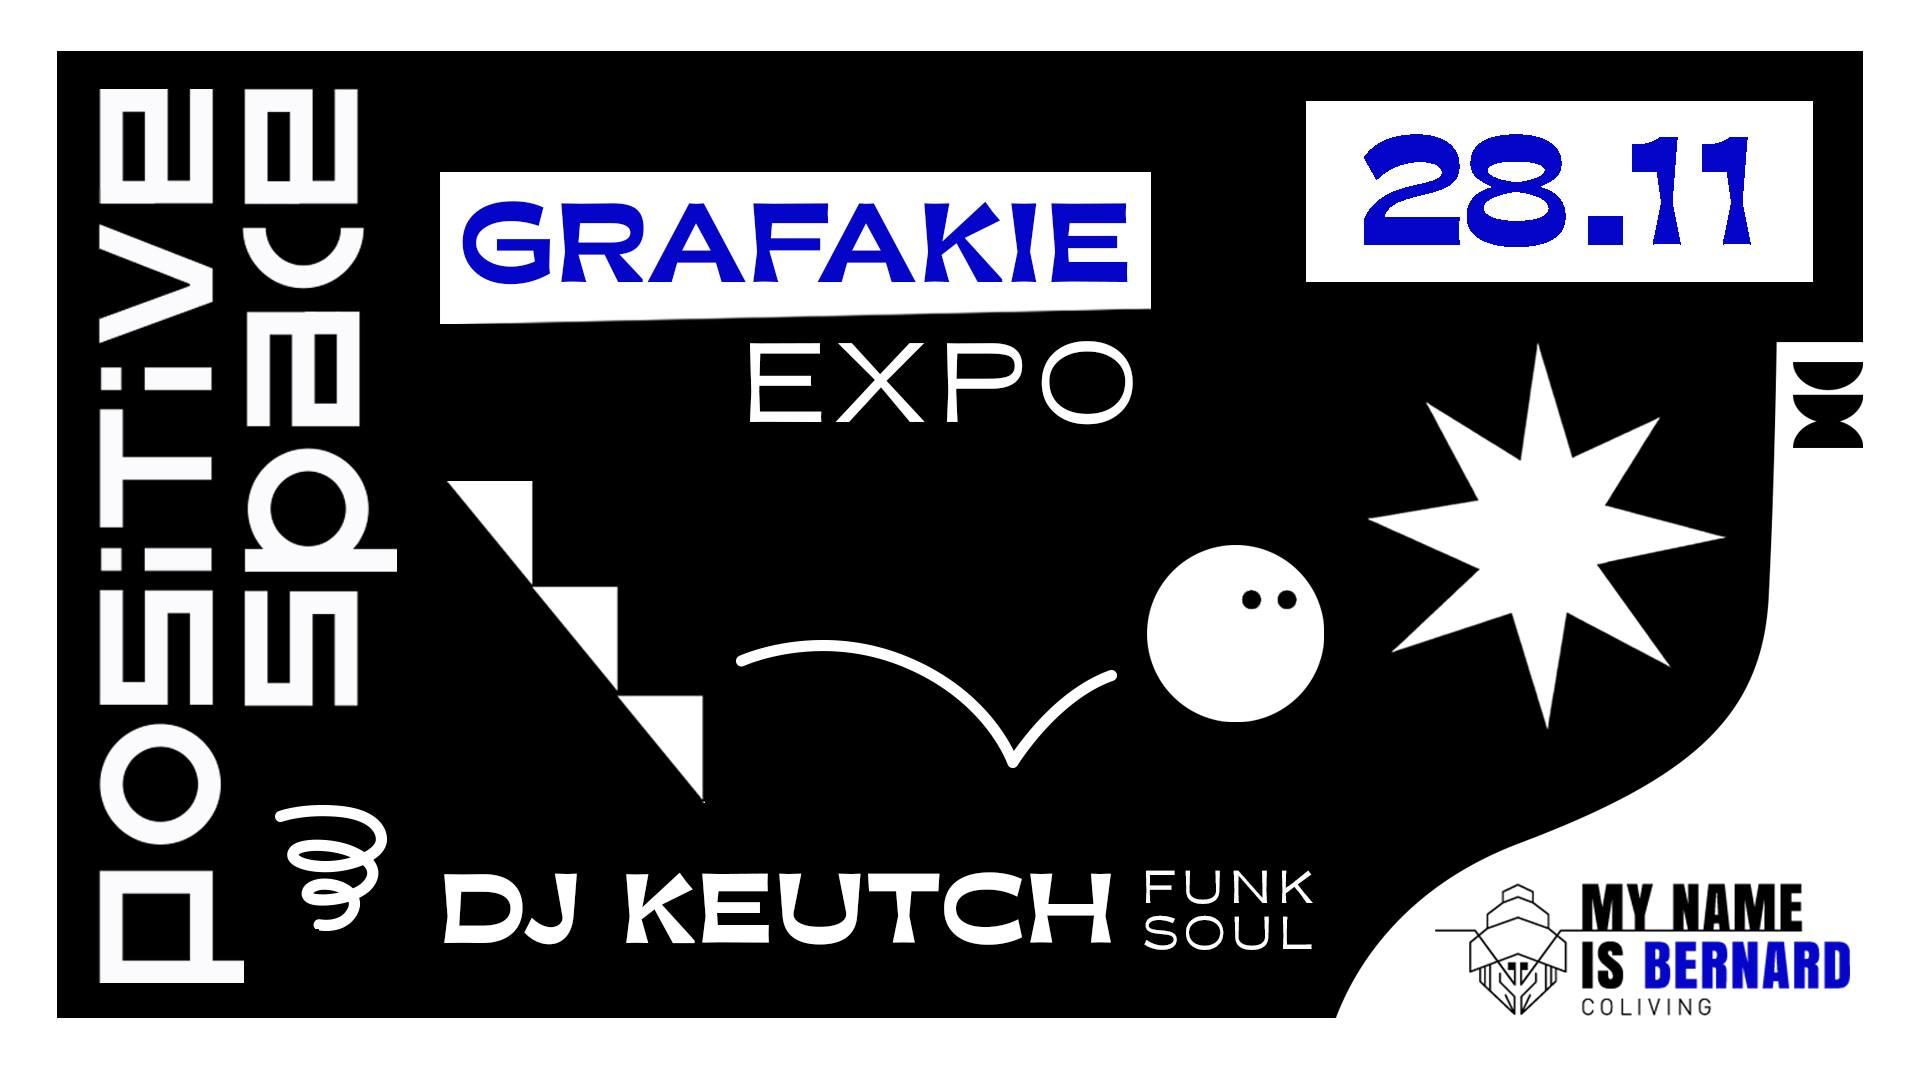 Exposition Grafakie / Positive space